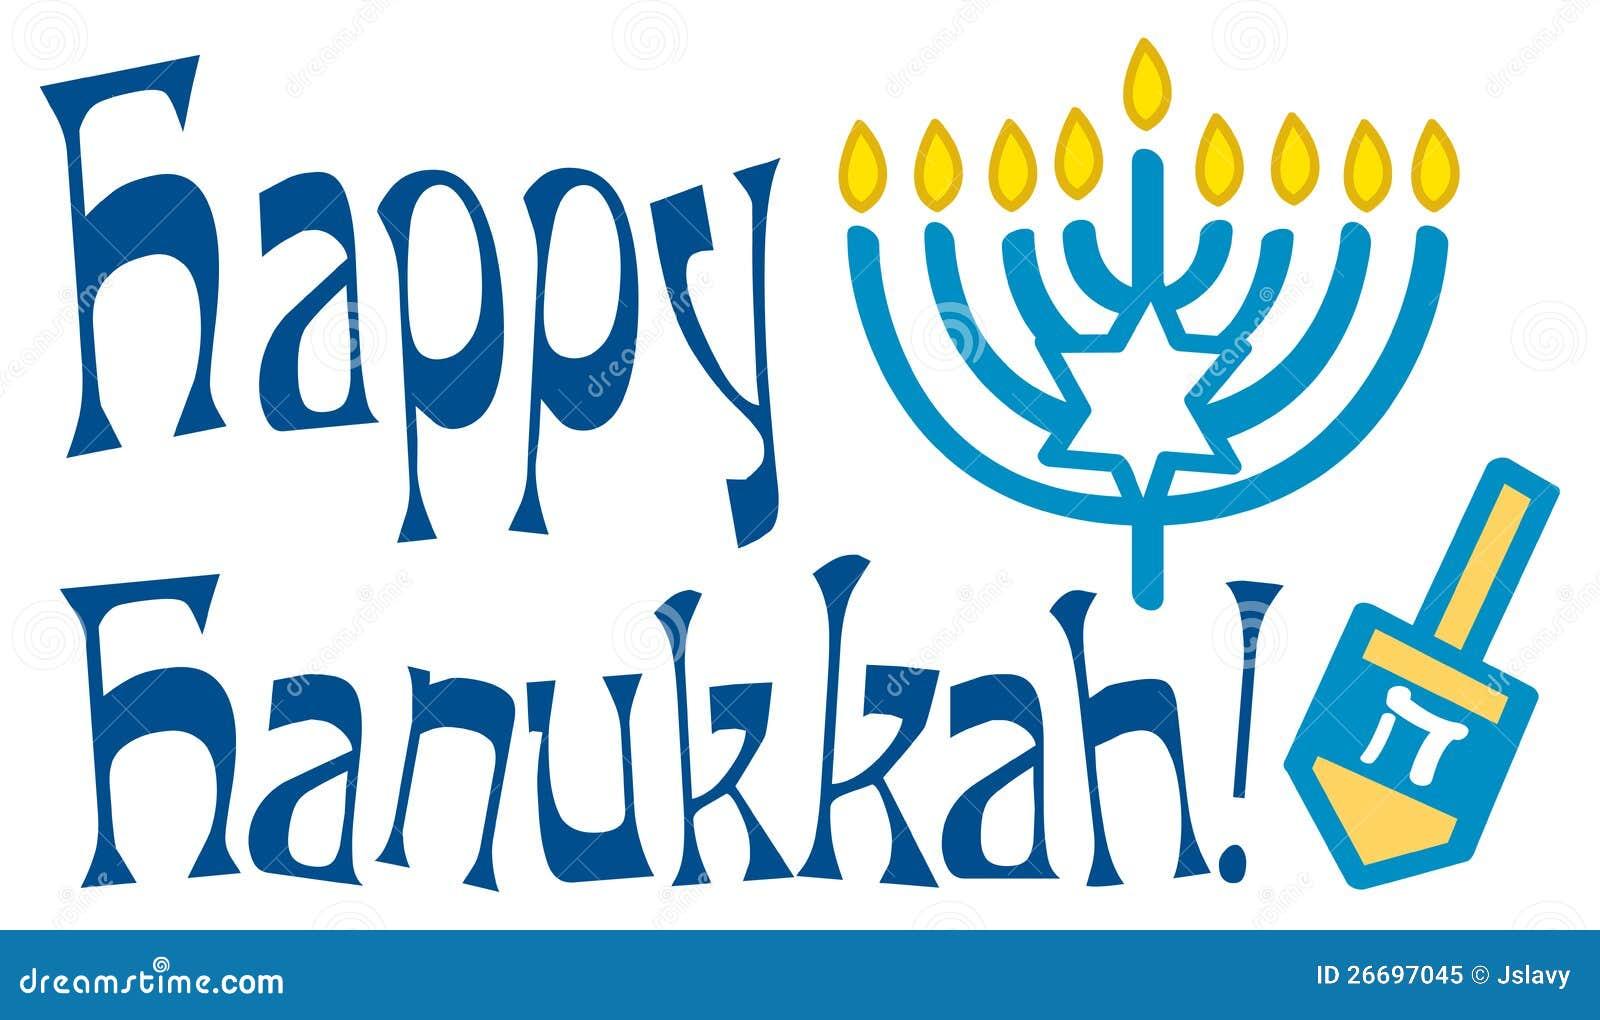 Happy Hanukkah Greeting Royalty Free Stock Photo - Image: 26697045